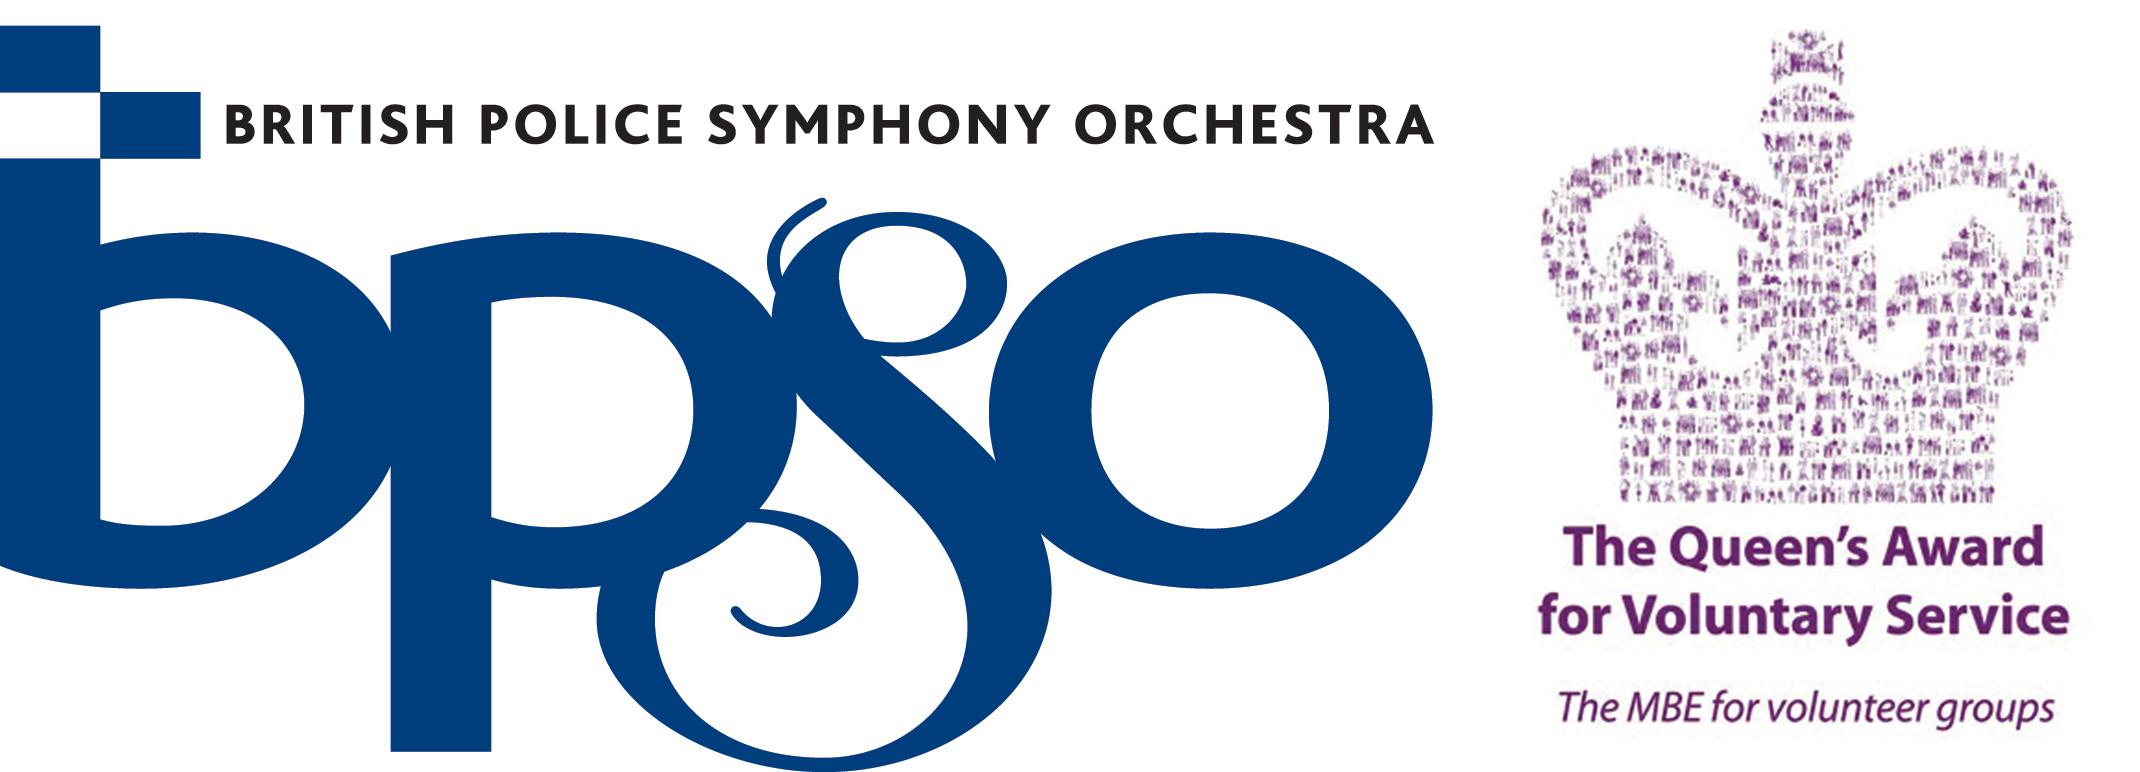 British Police Symphony Orchestra Logo